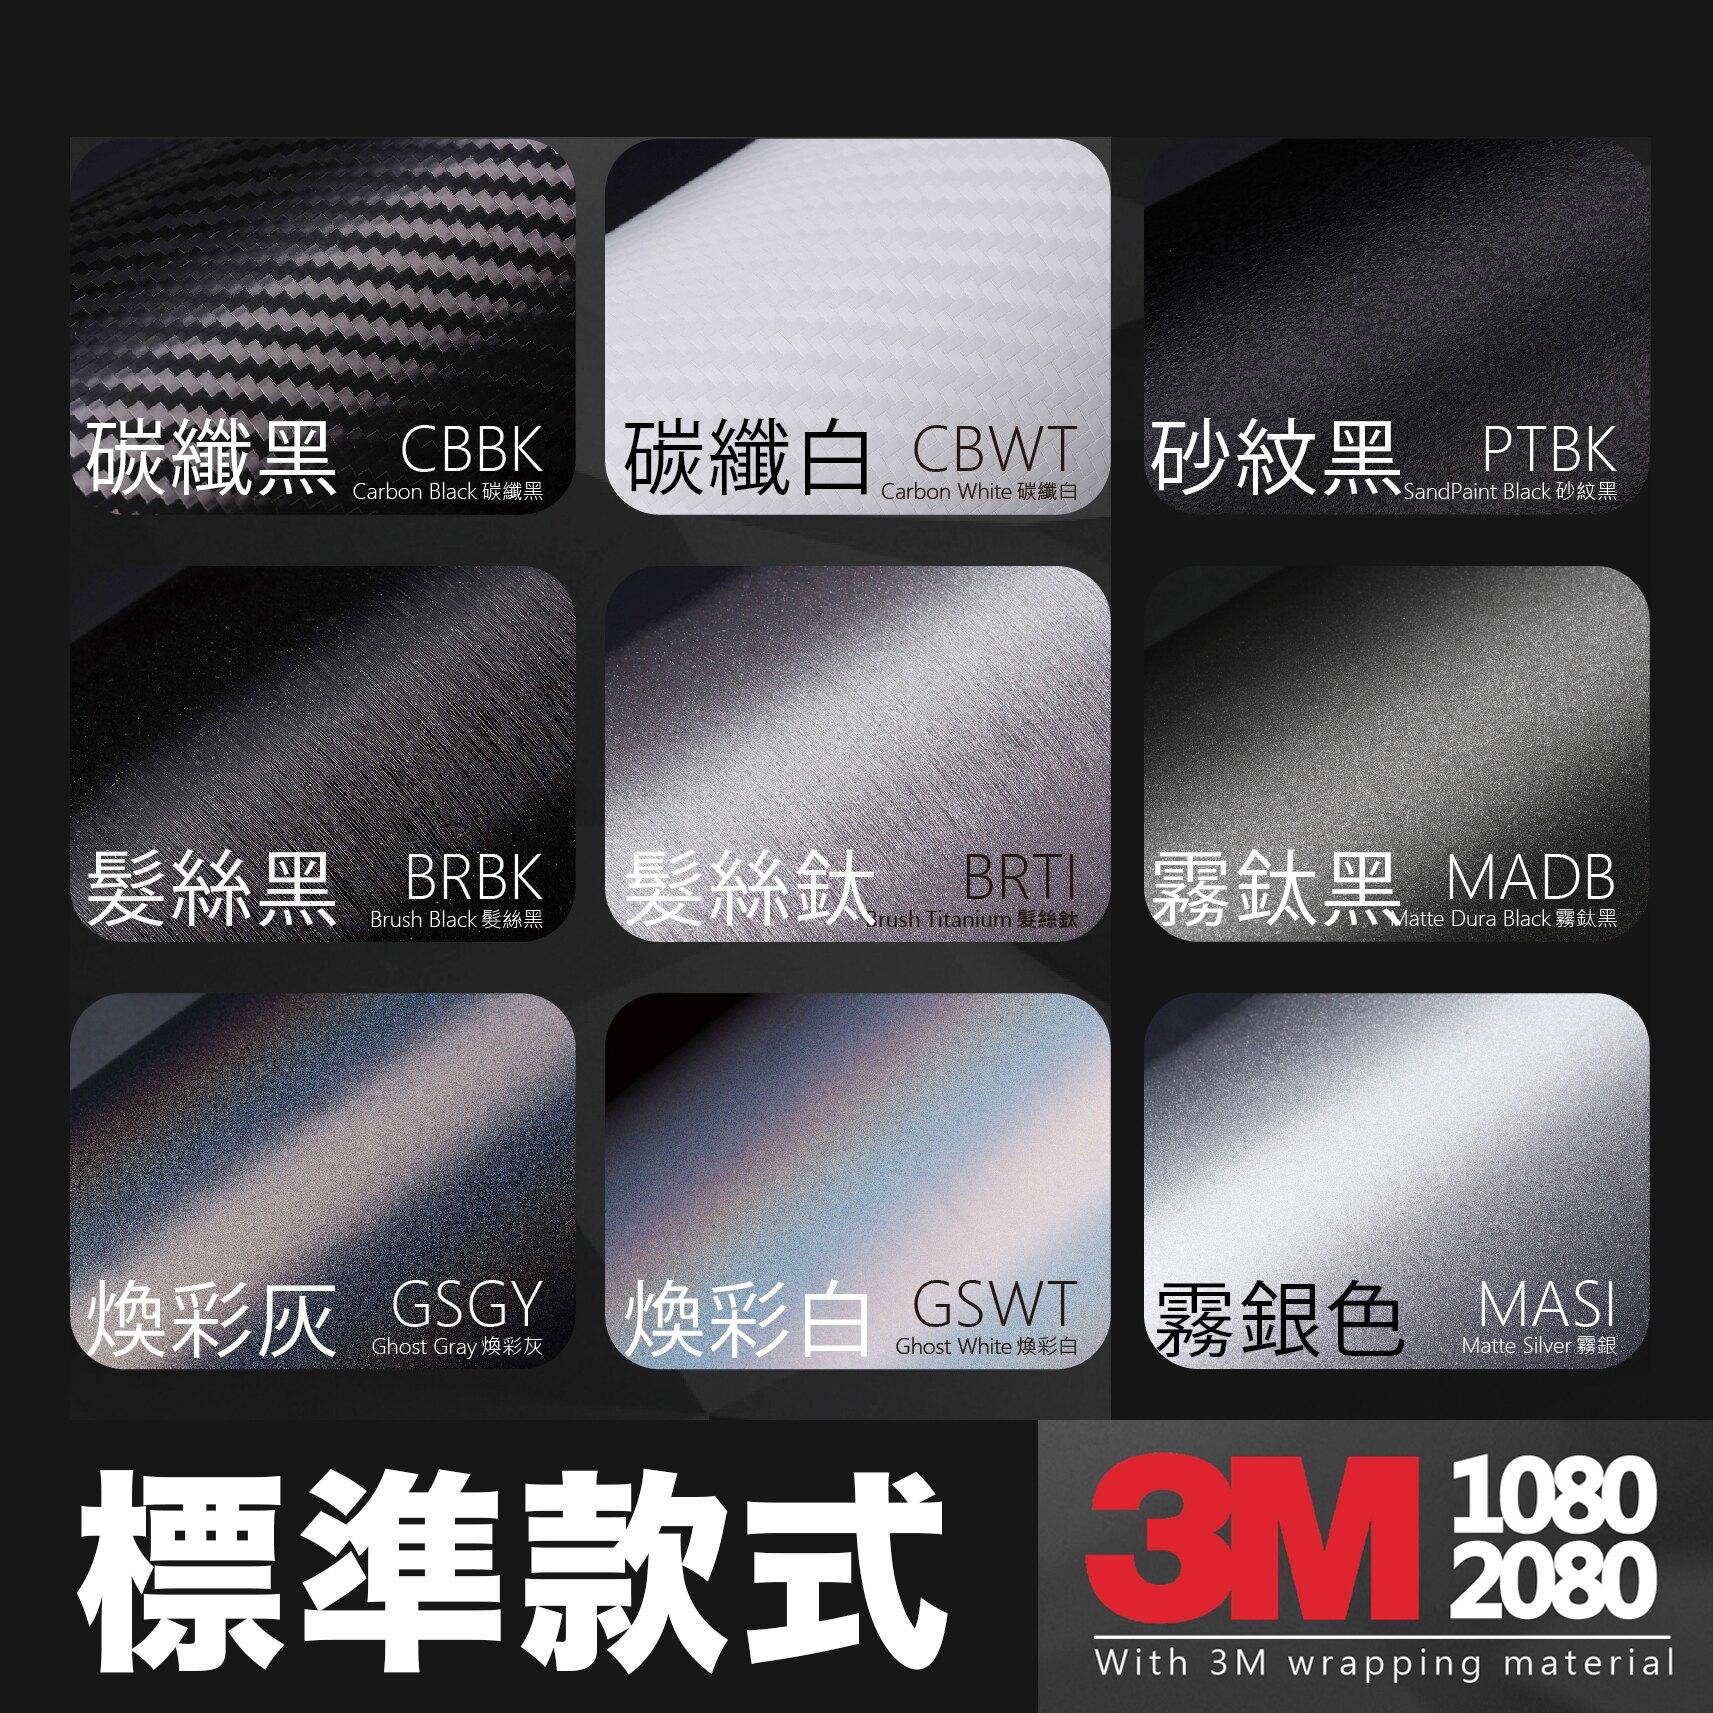 LIFE+GUARD 相機 鏡頭 包膜 SIGMA 14-24mm F2.8 DG DN Art (E-mount / L-mount)  (標準款式)